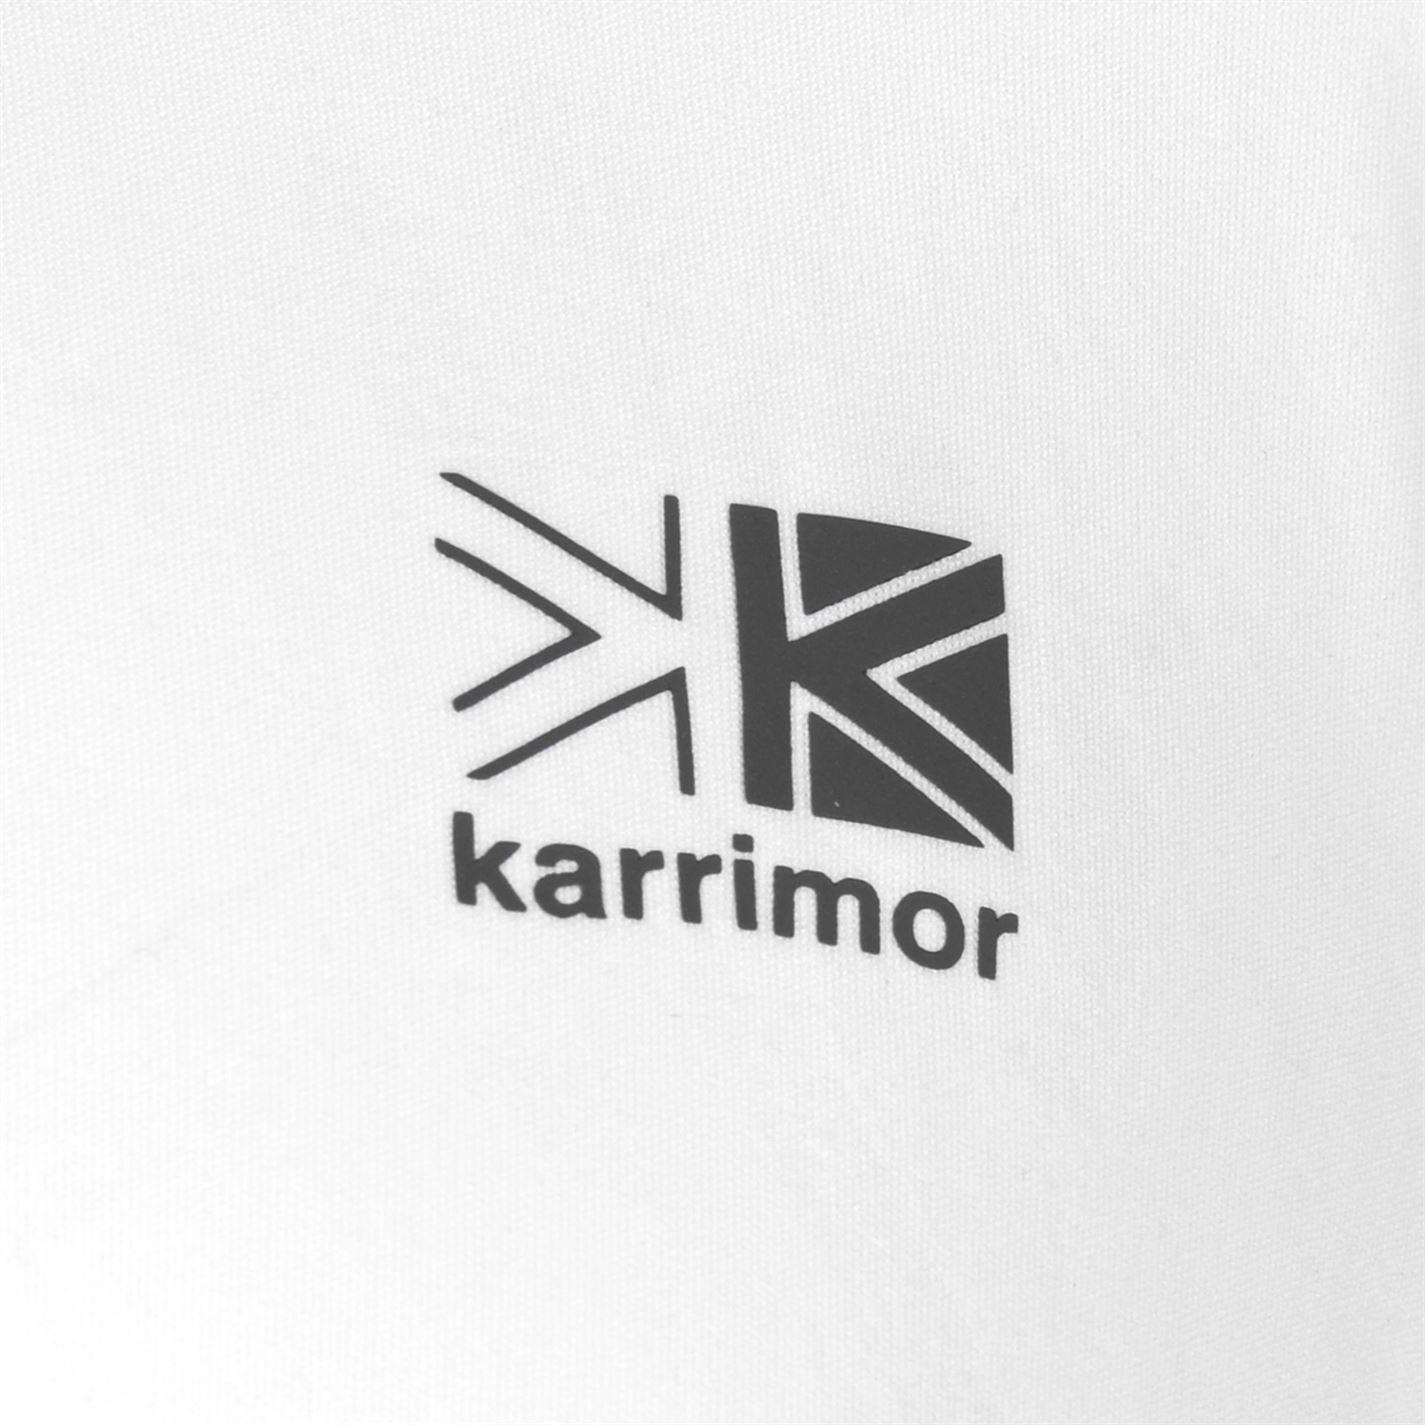 Karrimor-Hombres-X-Lite-Camiseta-mangas-cortas-de-carrera-Rendimiento-Camiseta-Top-Cuello-Redondo miniatura 26